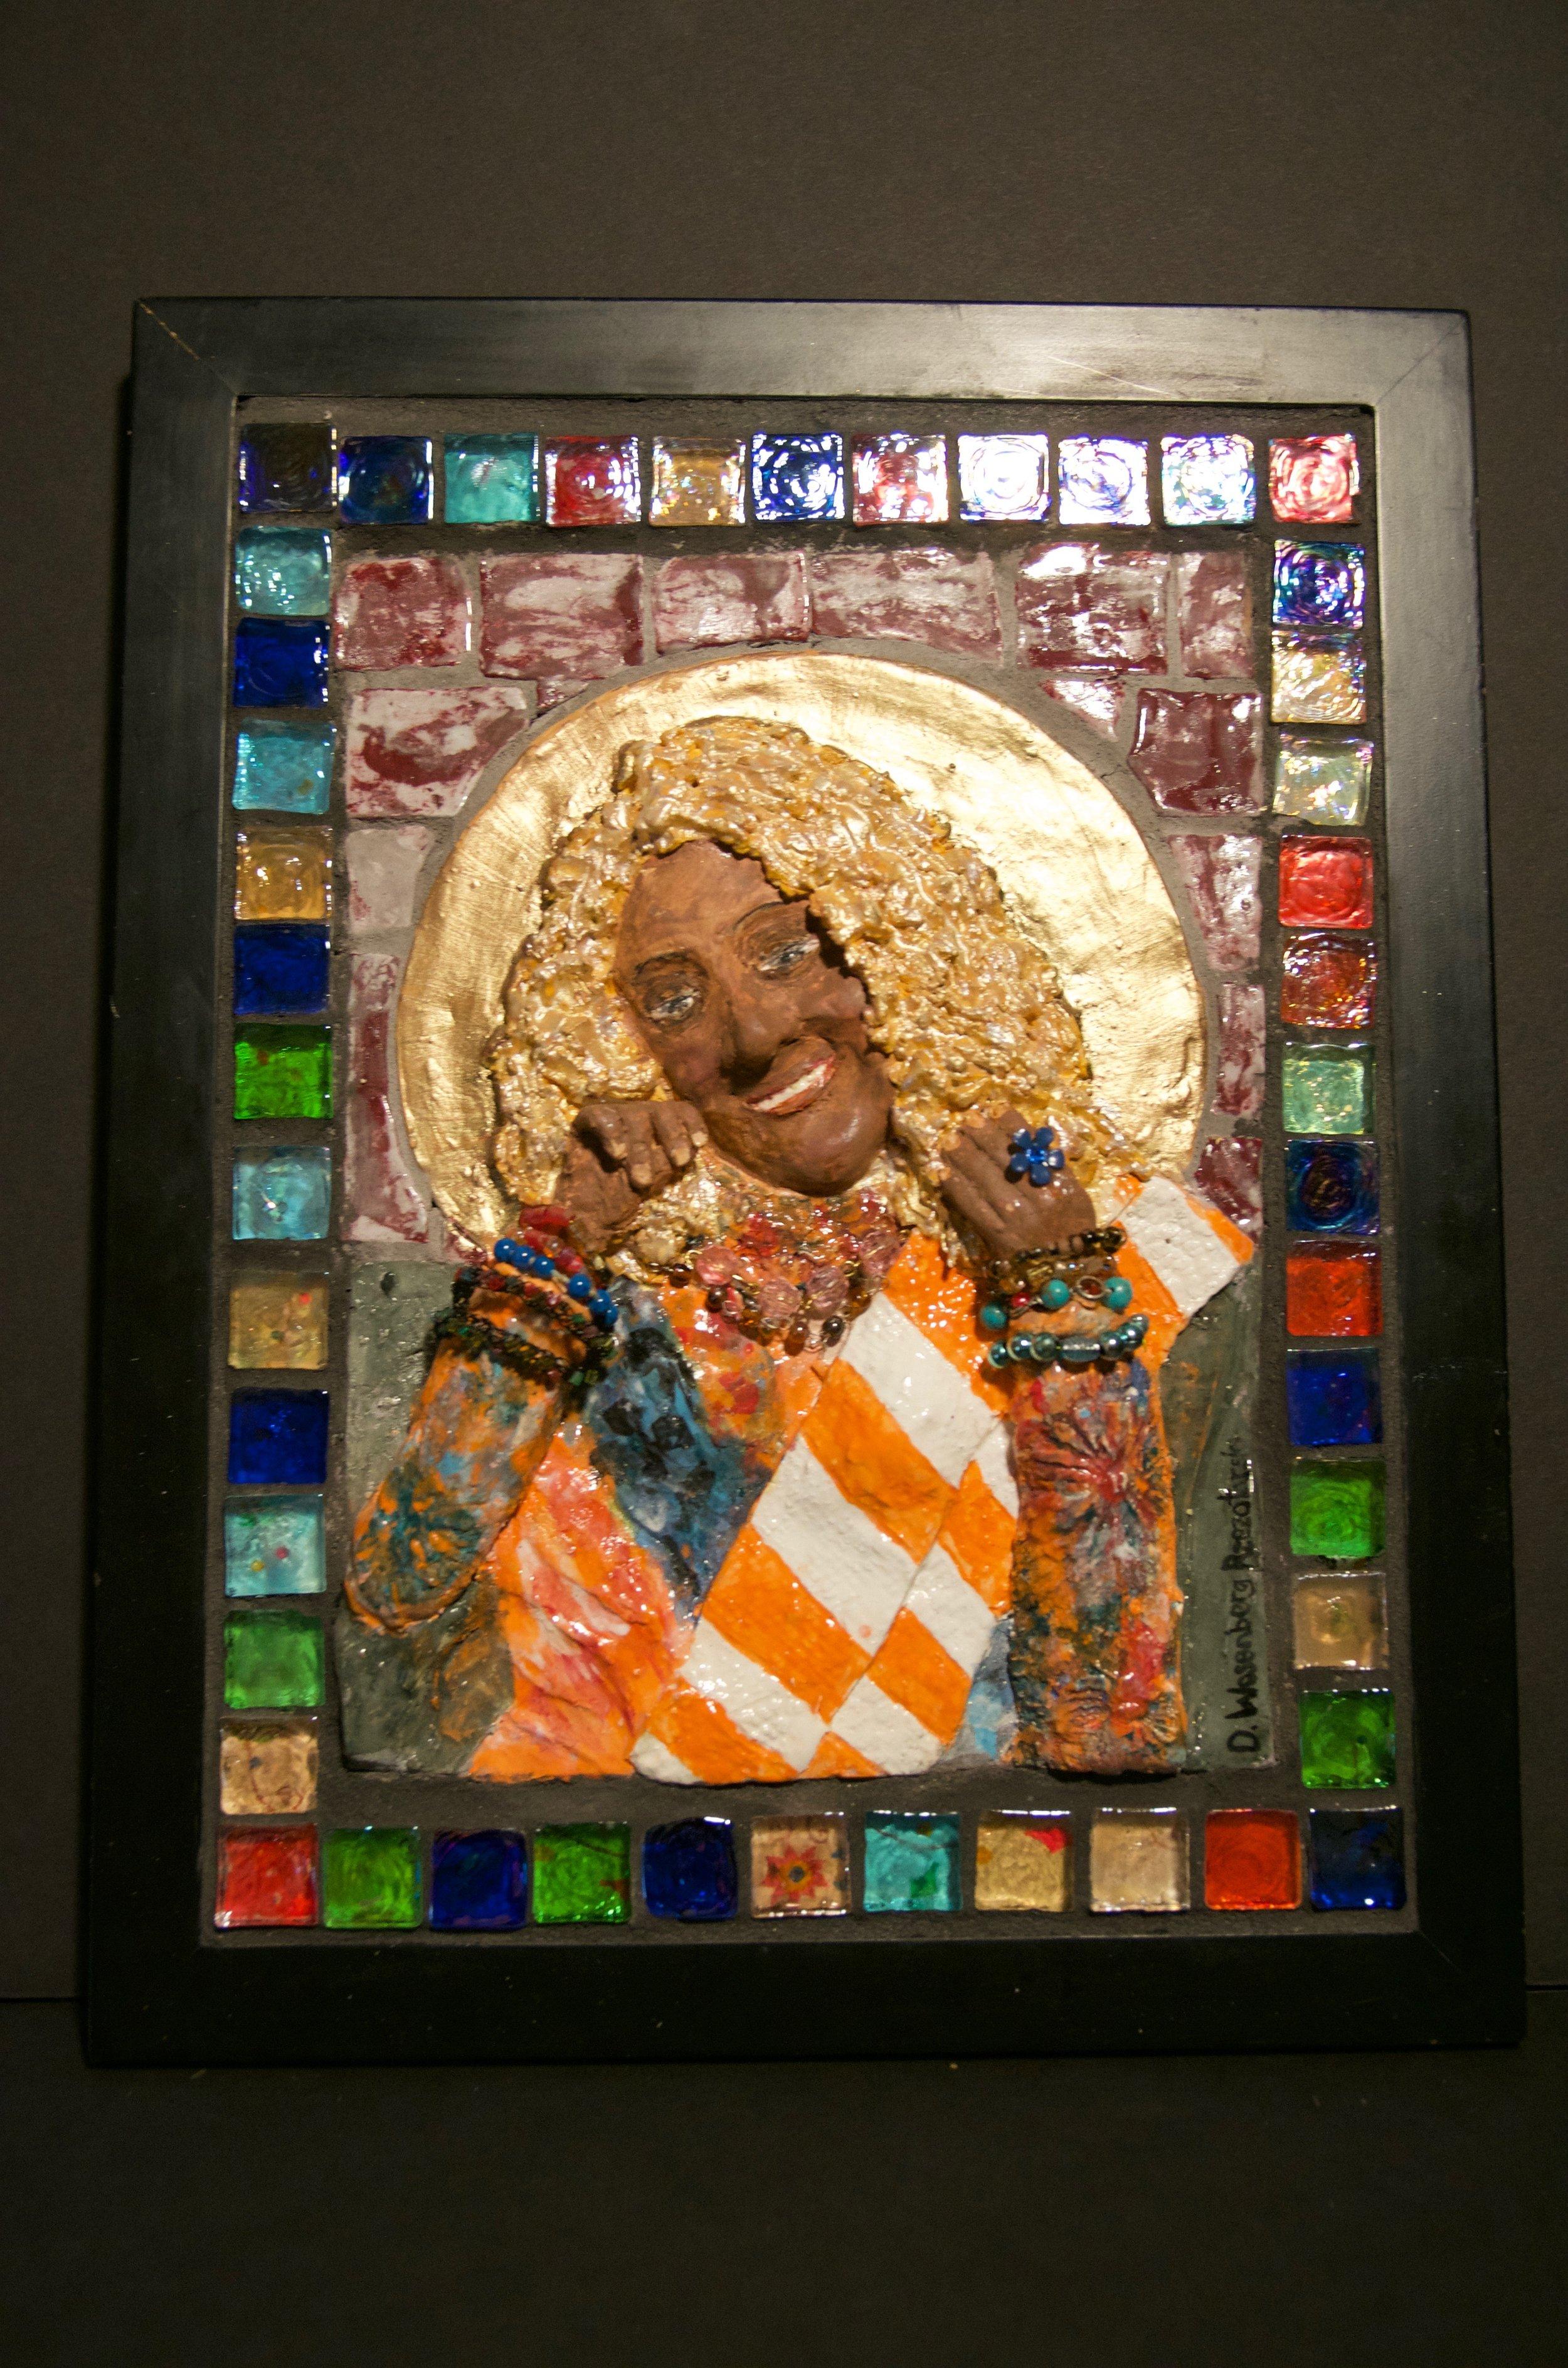 "DARLENE RZEZOTARSKI   Ceramic mosaic and mixed media | 11.5""x14"" (framed)   PRICE:  $700"